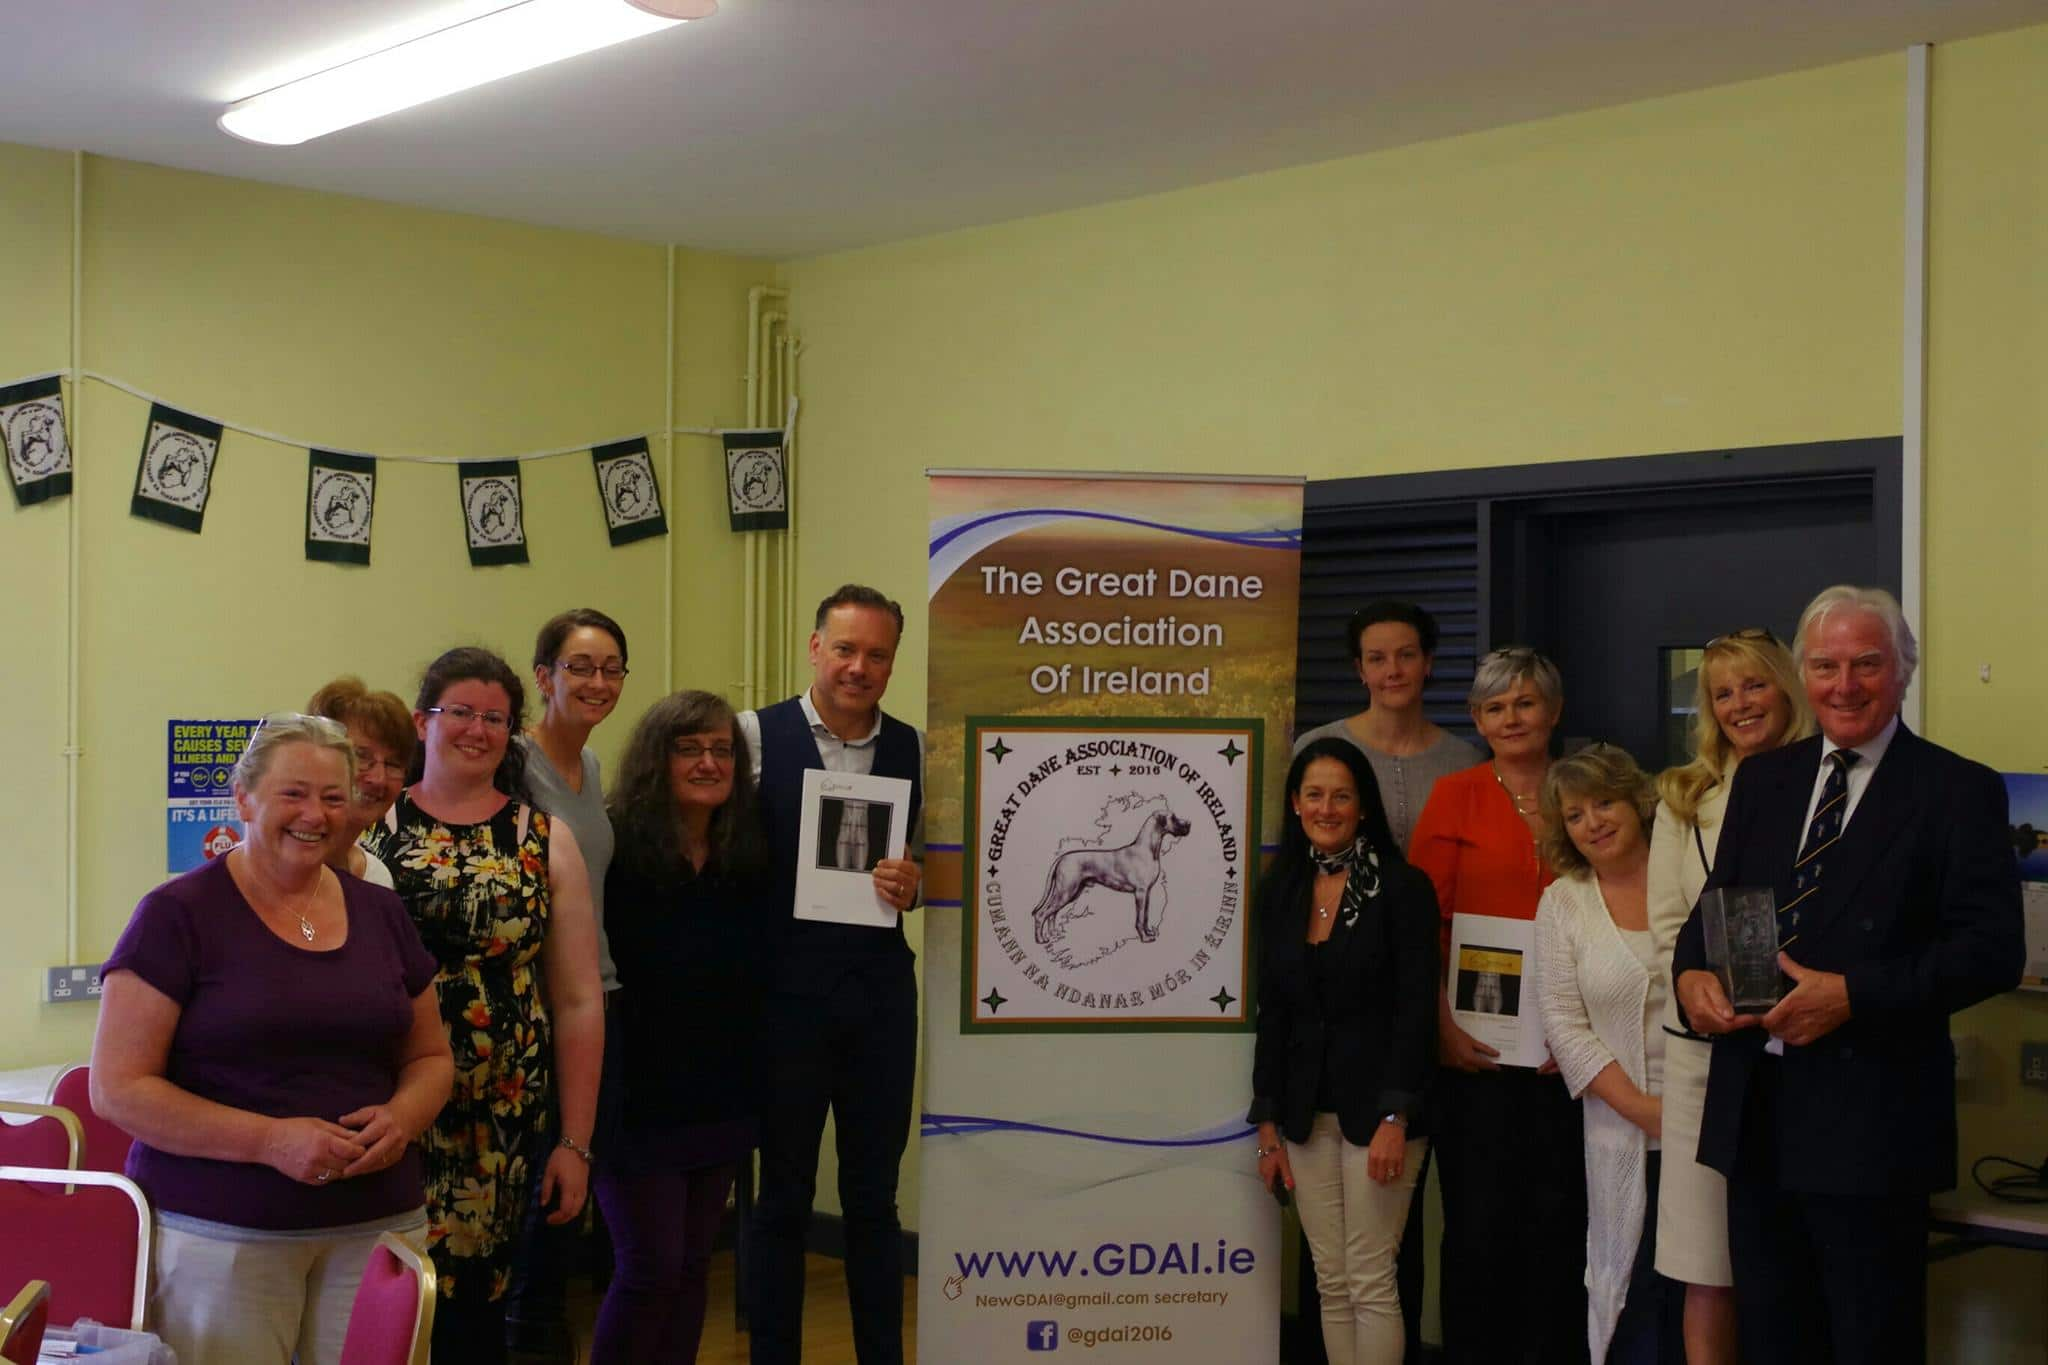 Great Dane Association of Ireland